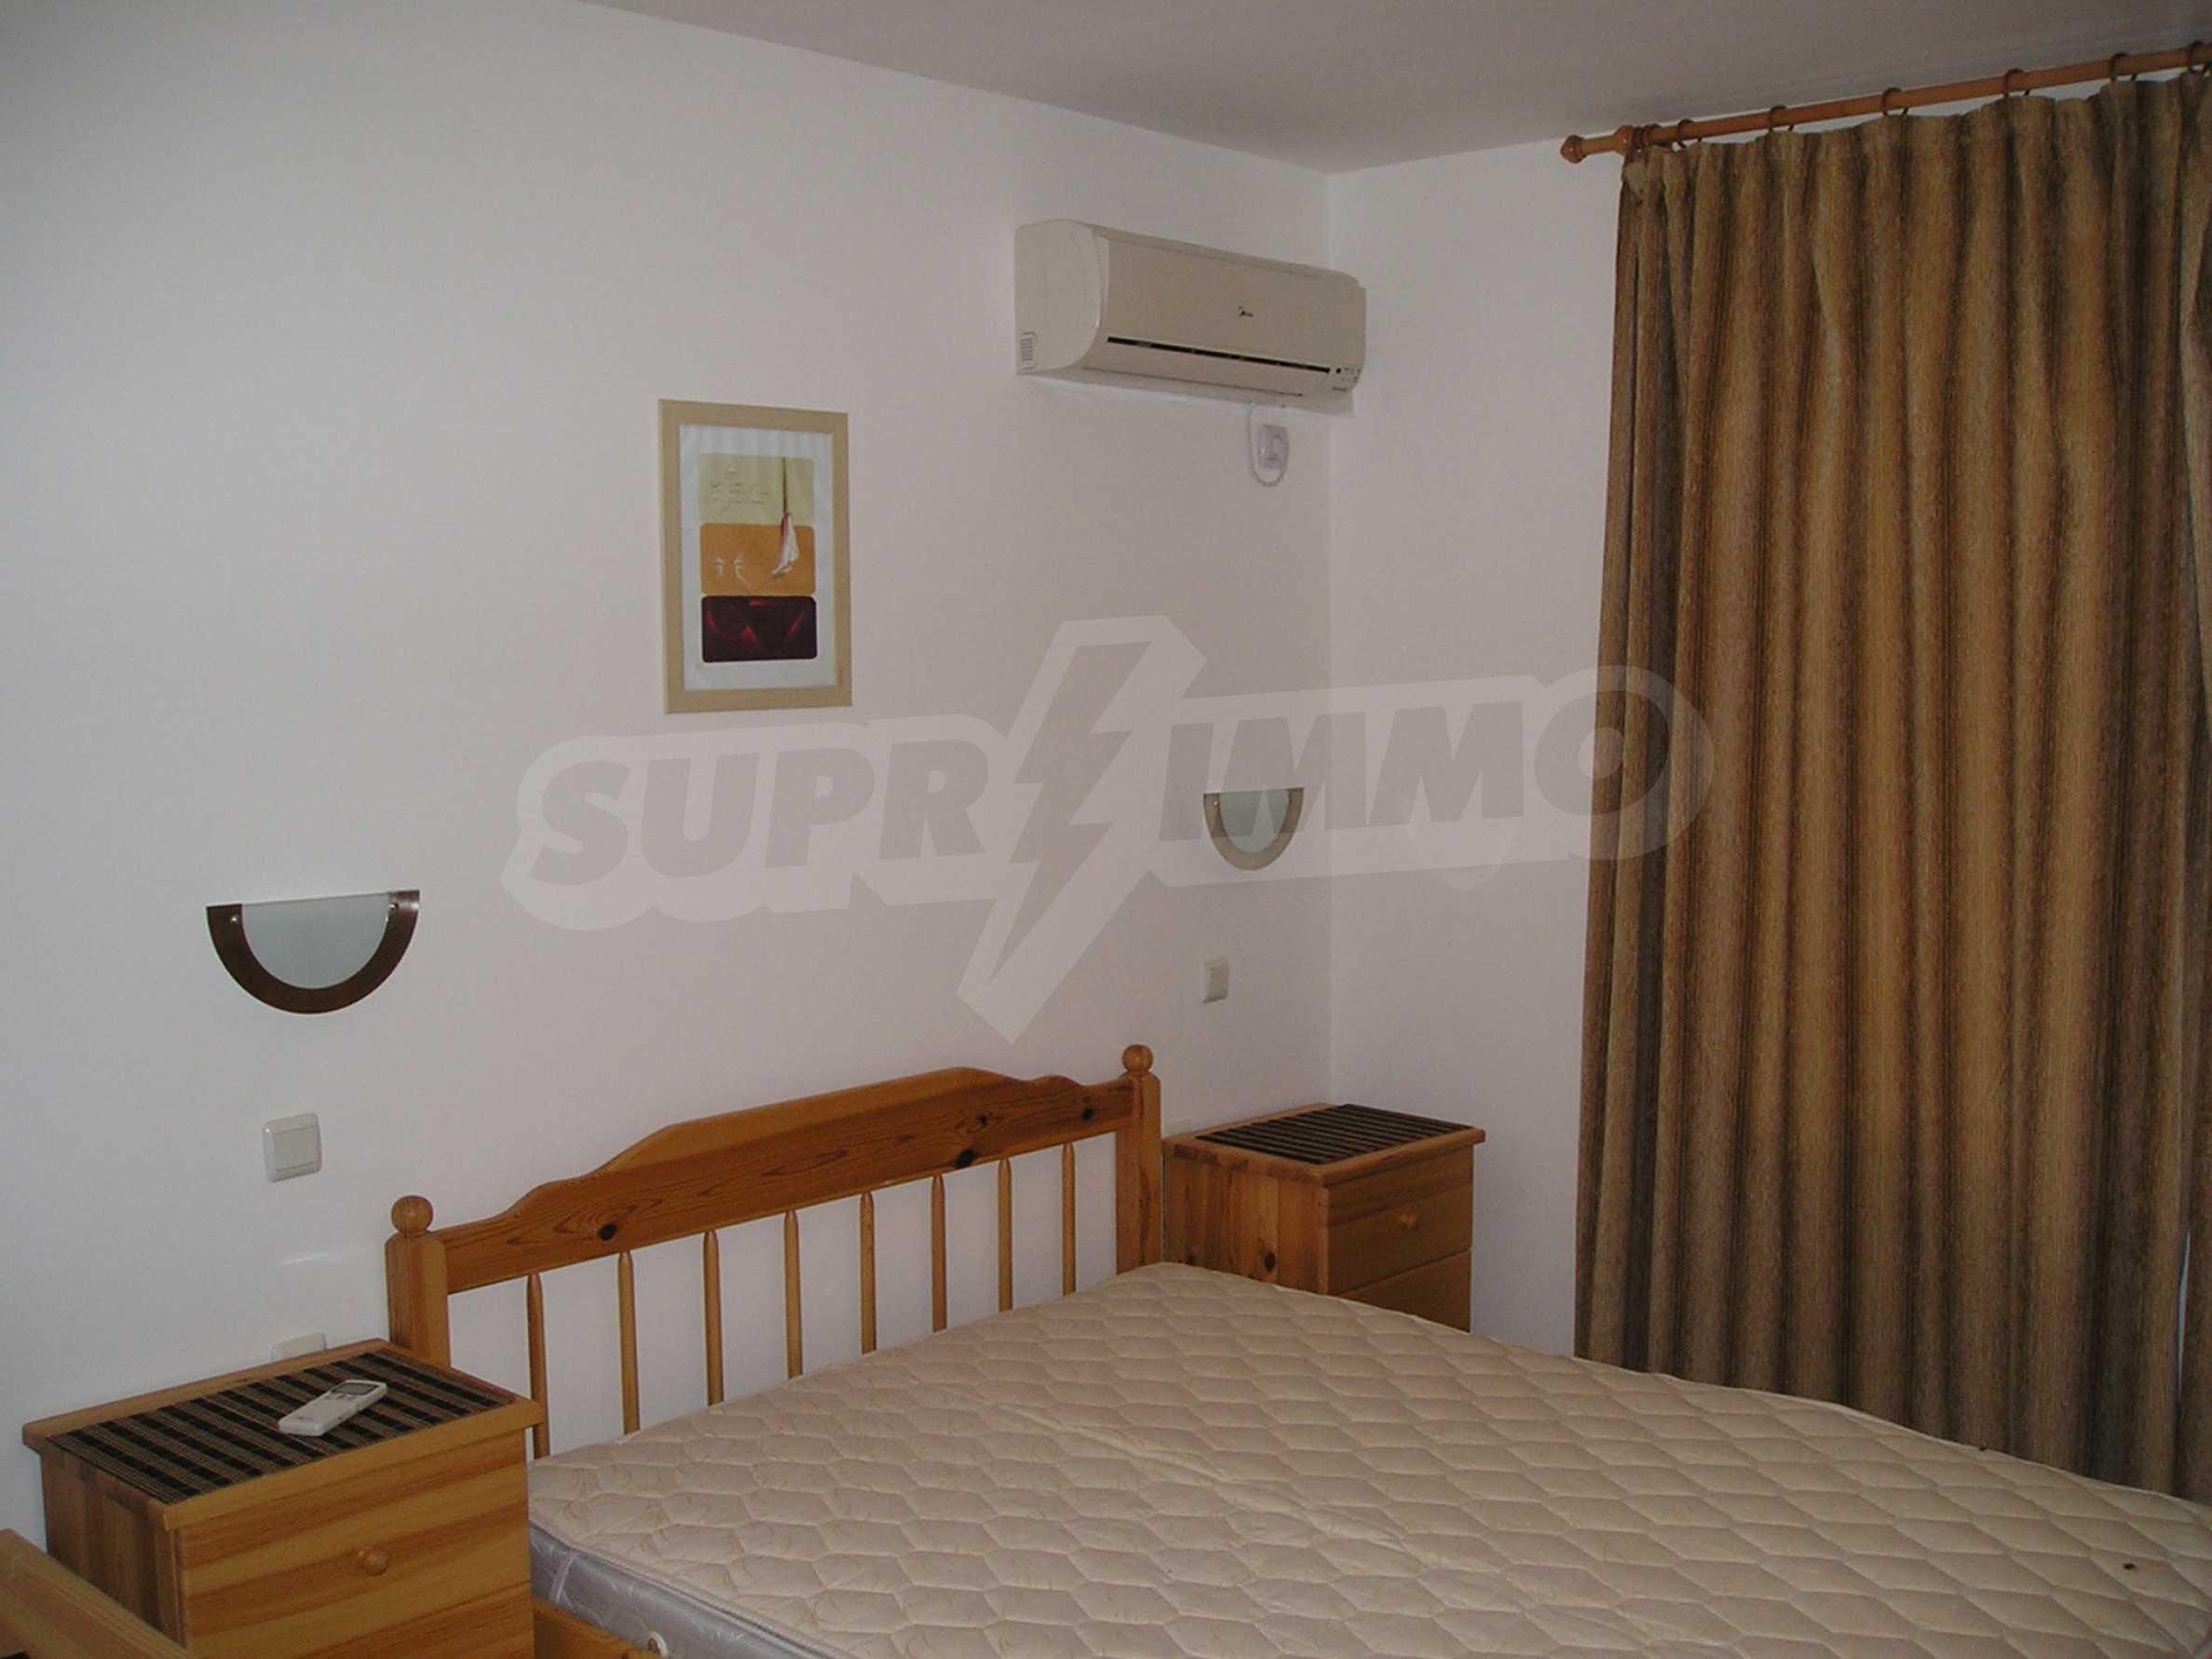 One-bedroom apartment in Sunset Apartments 1 in Kosharitsa 14